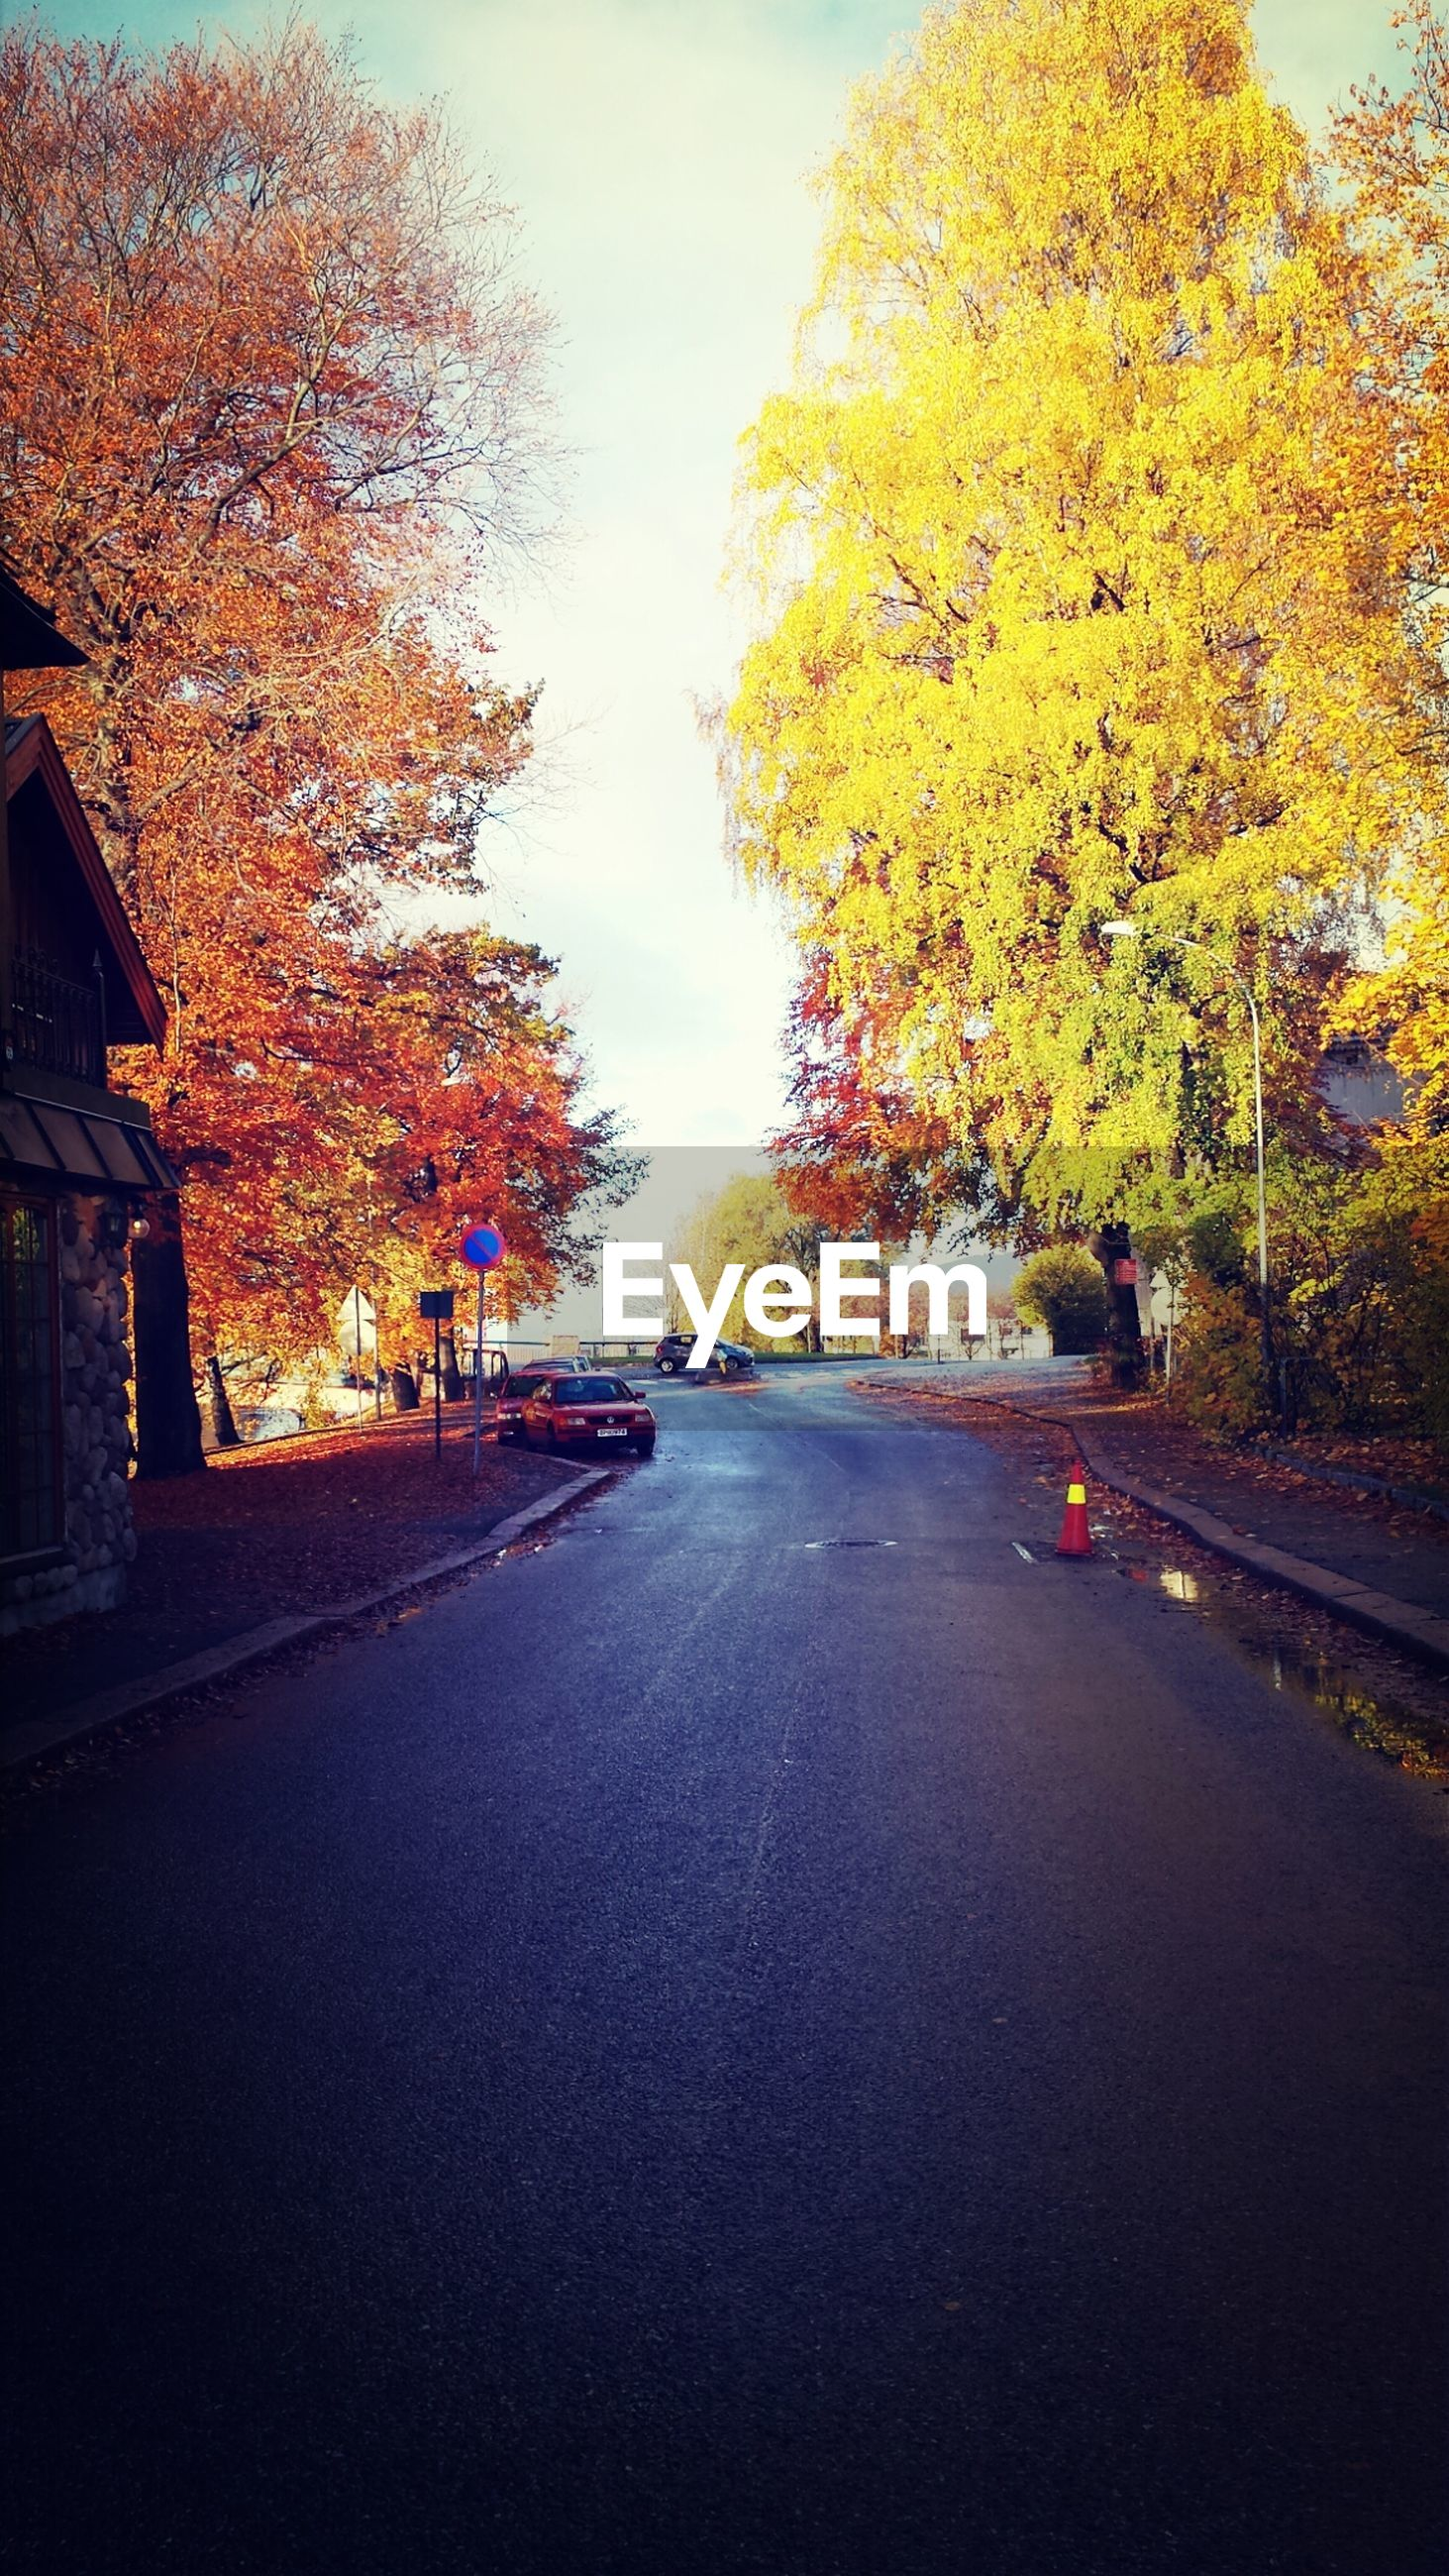 Street amidst autumn trees